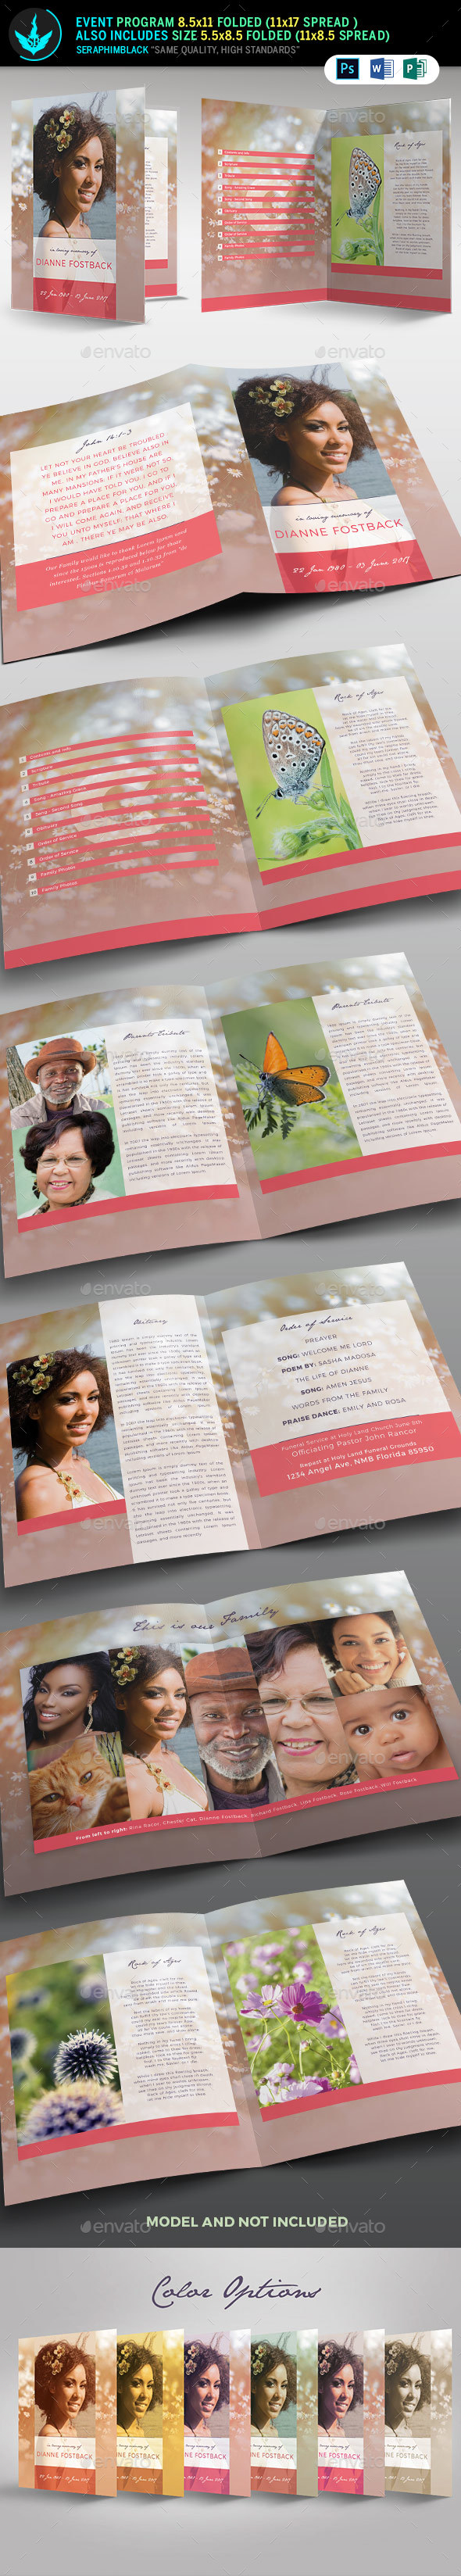 Meadow Modern Funeral Program Template - Informational Brochures